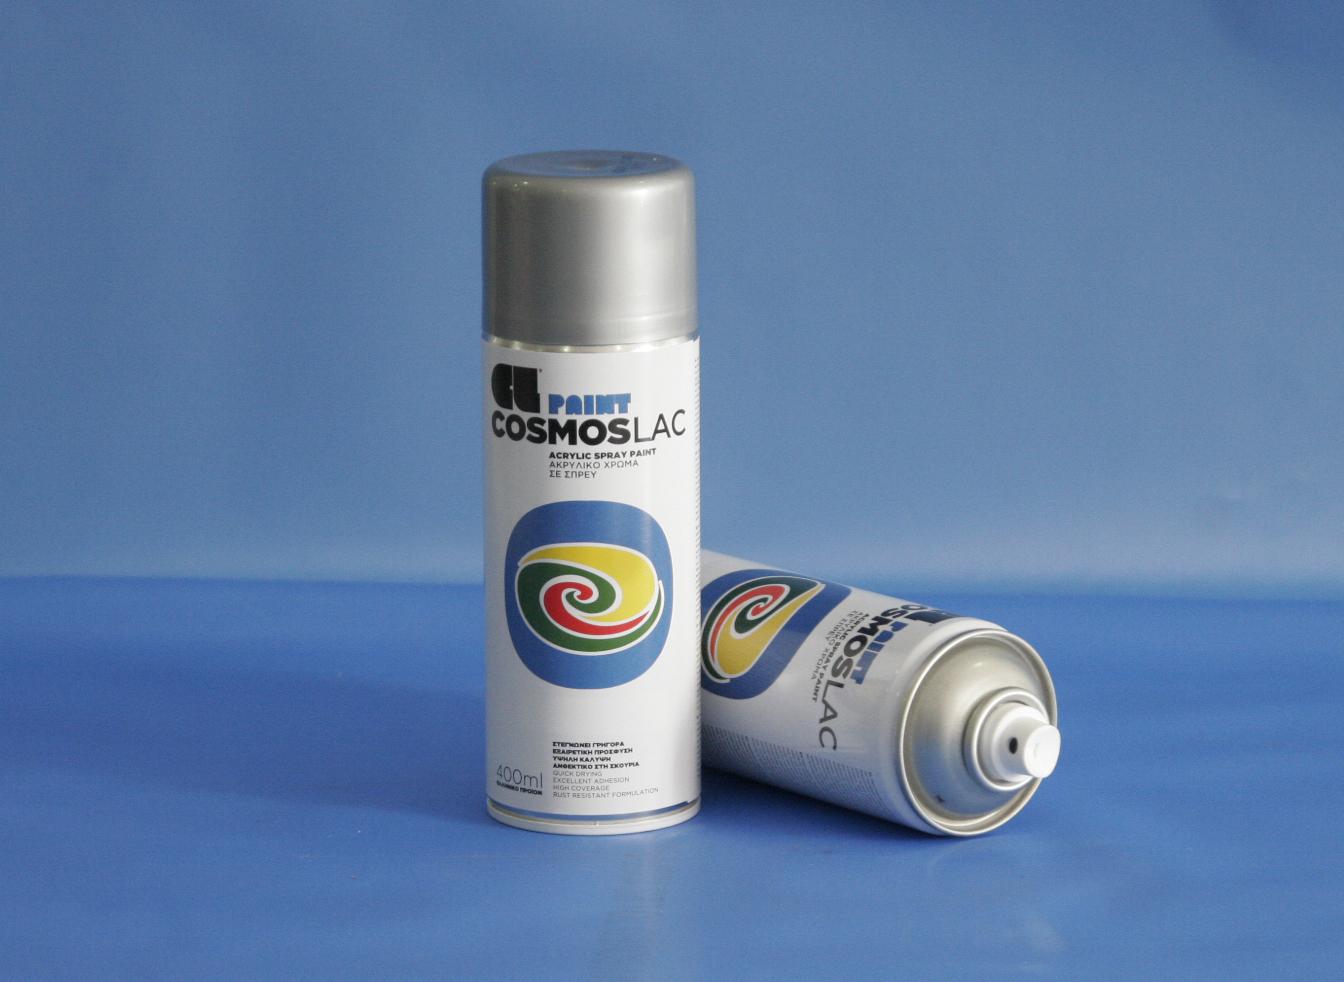 Cosmos-Lac N306 400ml Light Gray (Spray Can)